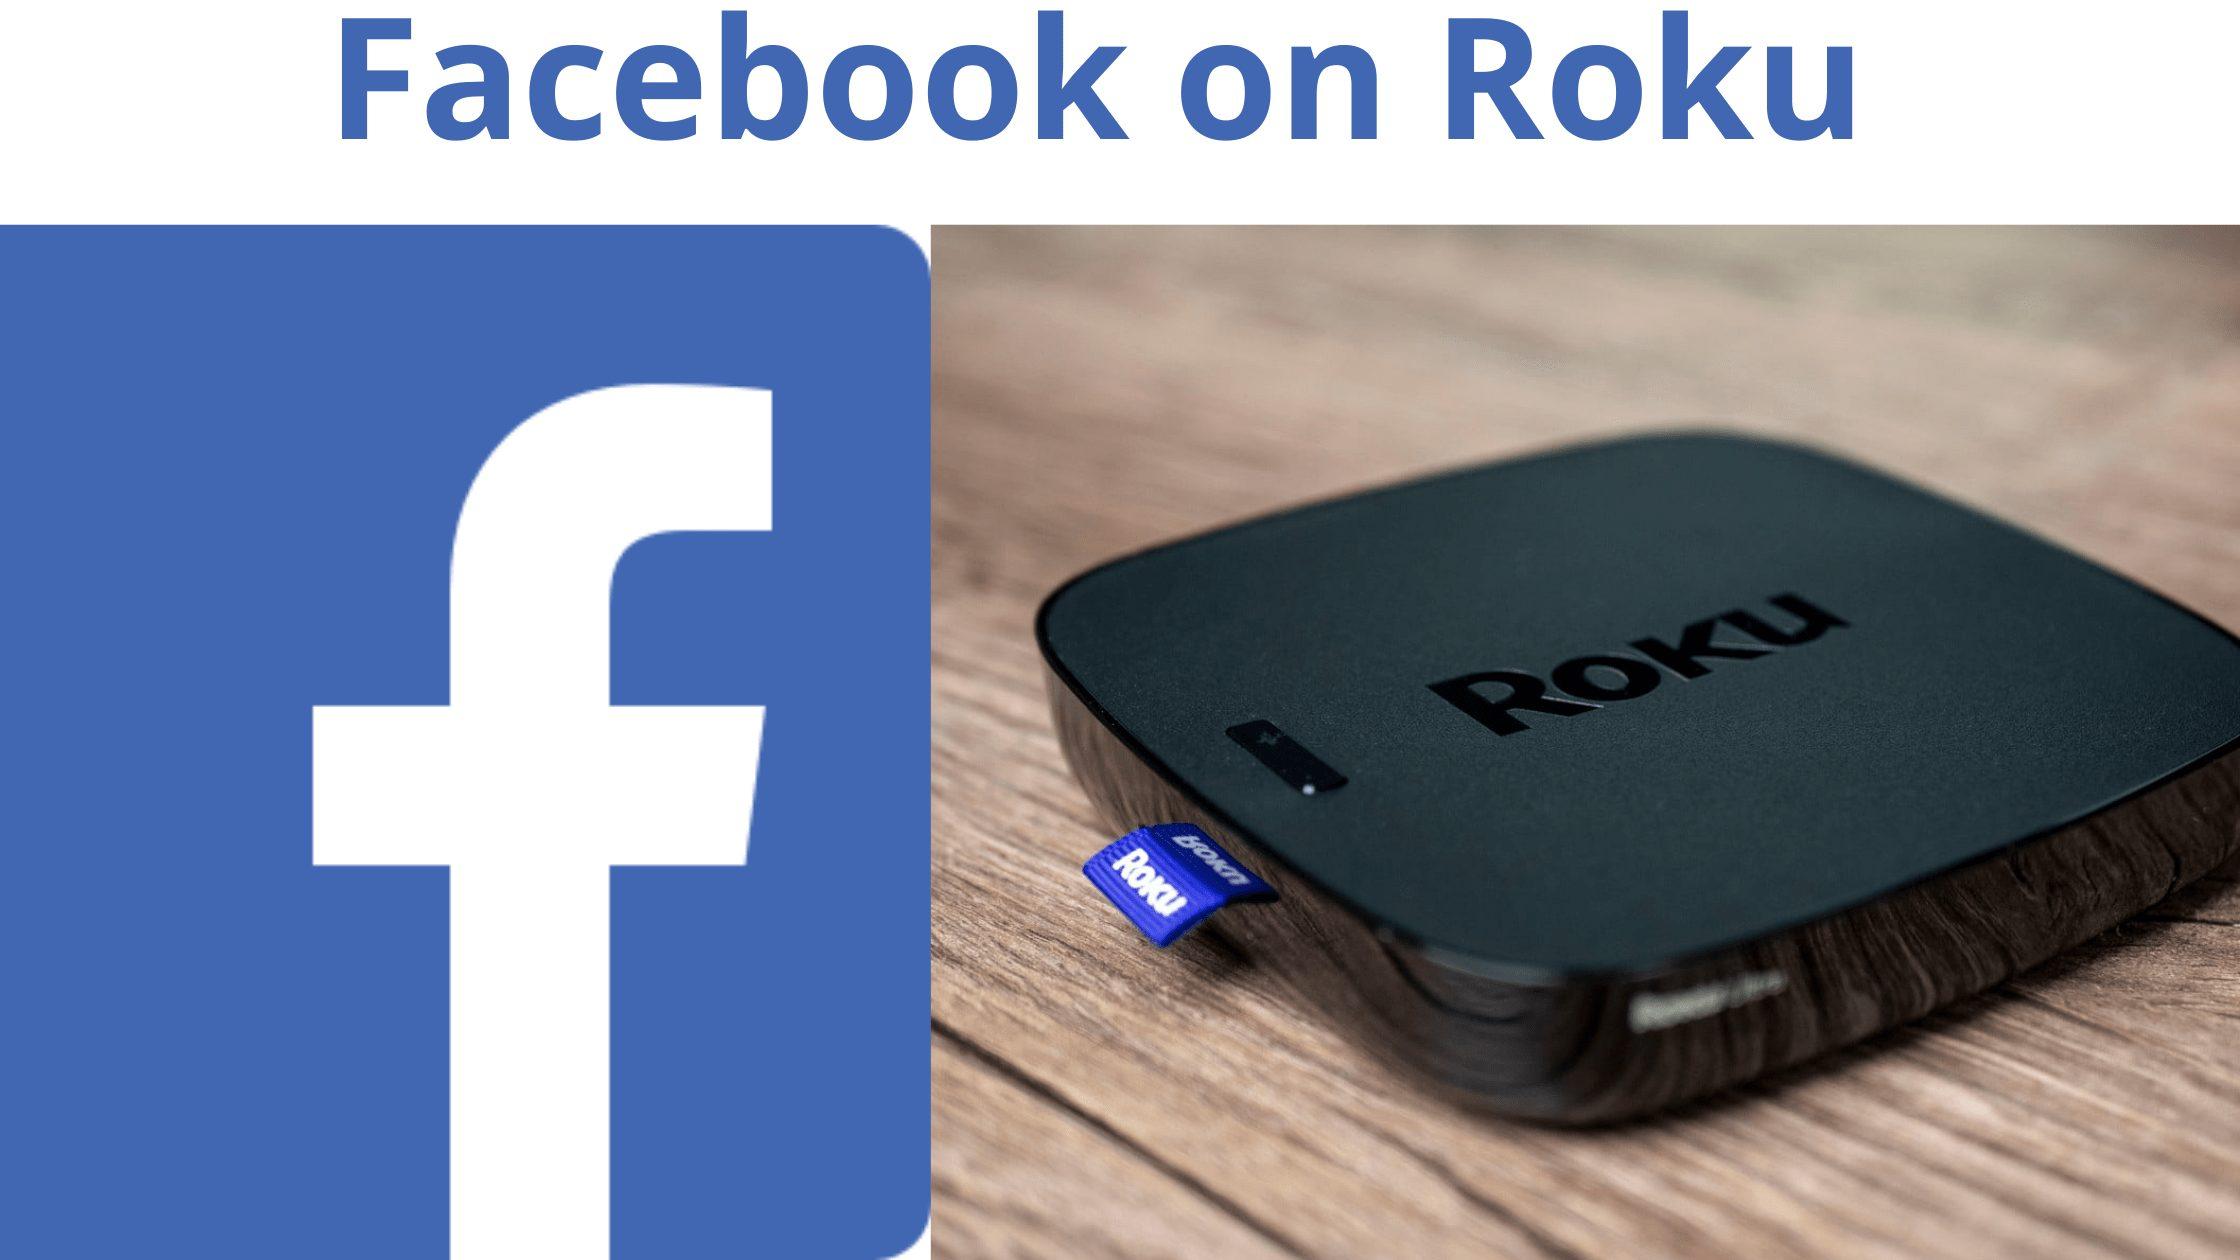 Facebook on Roku